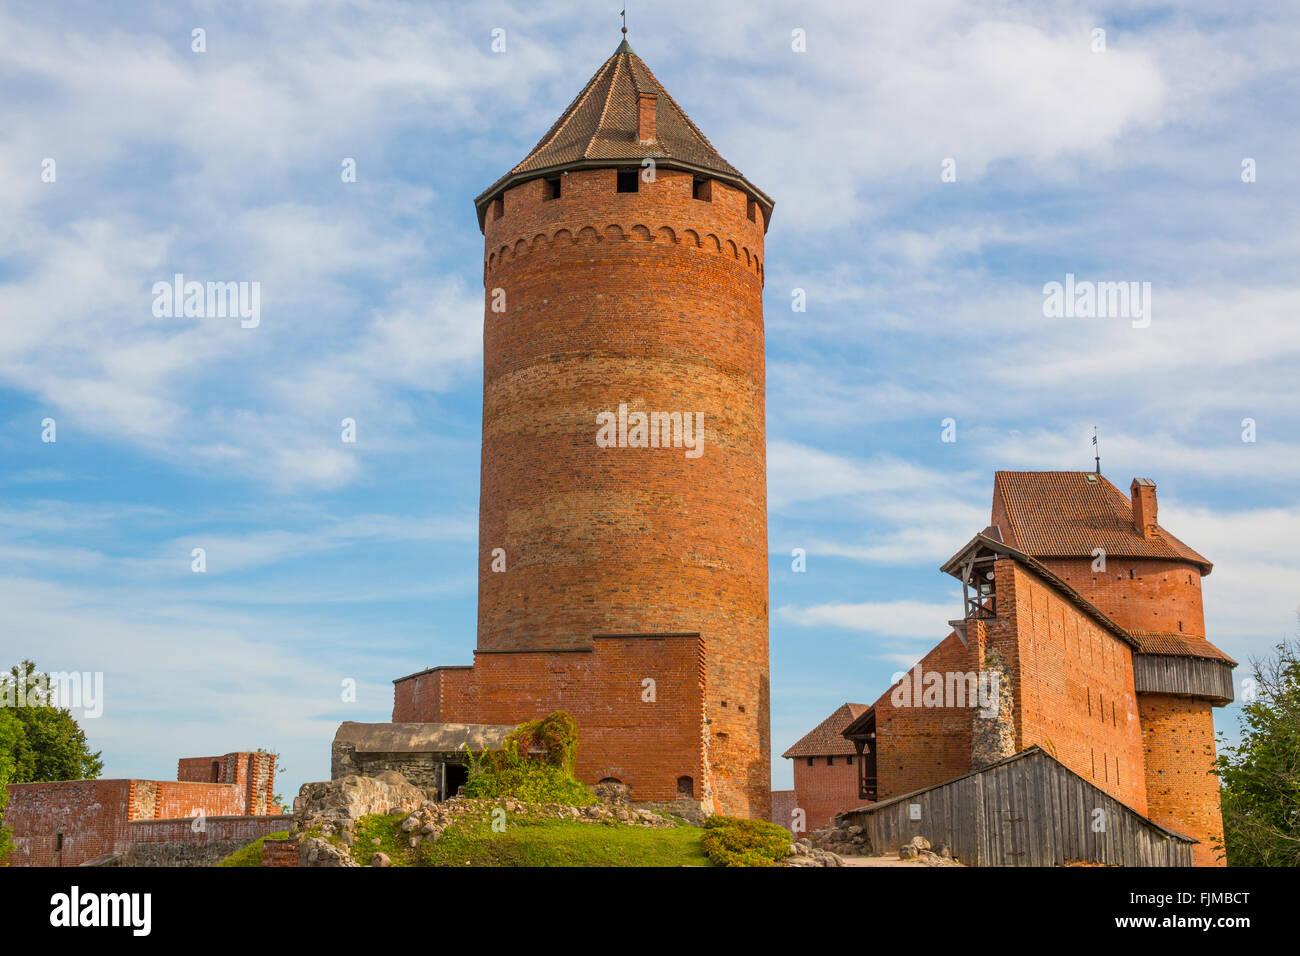 Géographie / billet, de la Lettonie, Riga, Turaida Castle, Additional-Rights Clearance-Info-Not-Available- Photo Stock